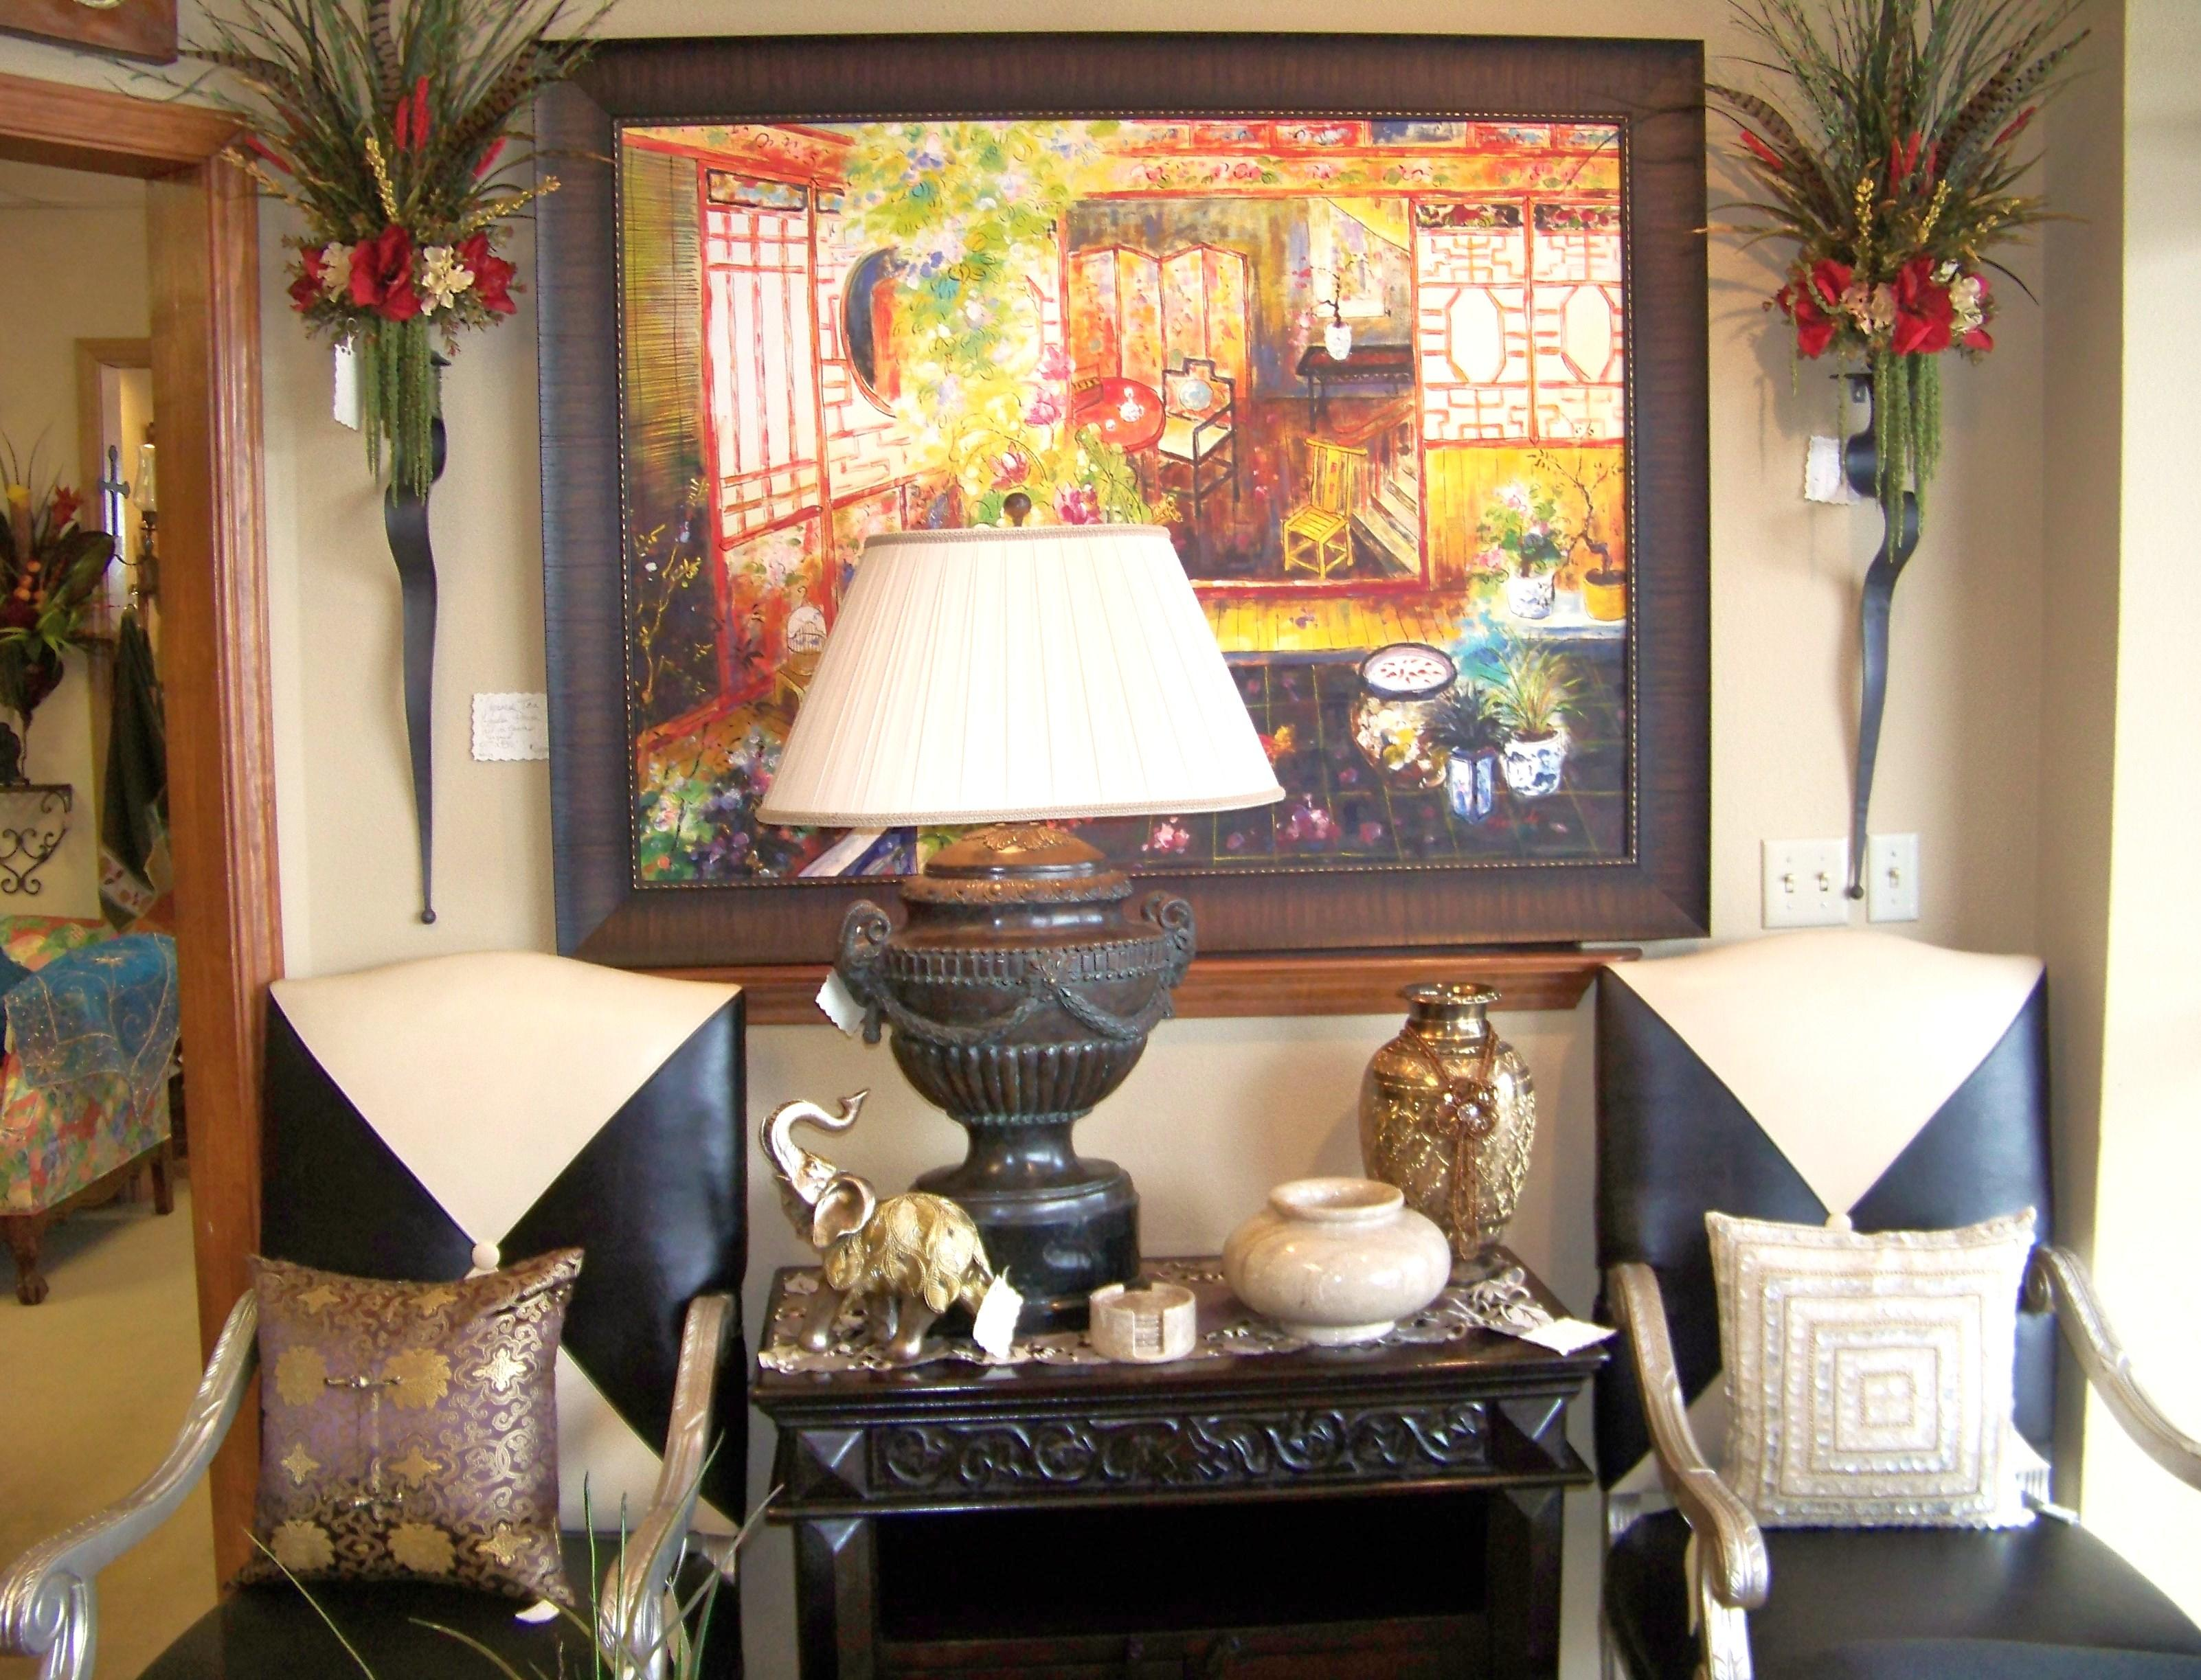 Closet Connoisseur Resale Furniture Fashion Coupons Near Me In San Antonio 8coupons